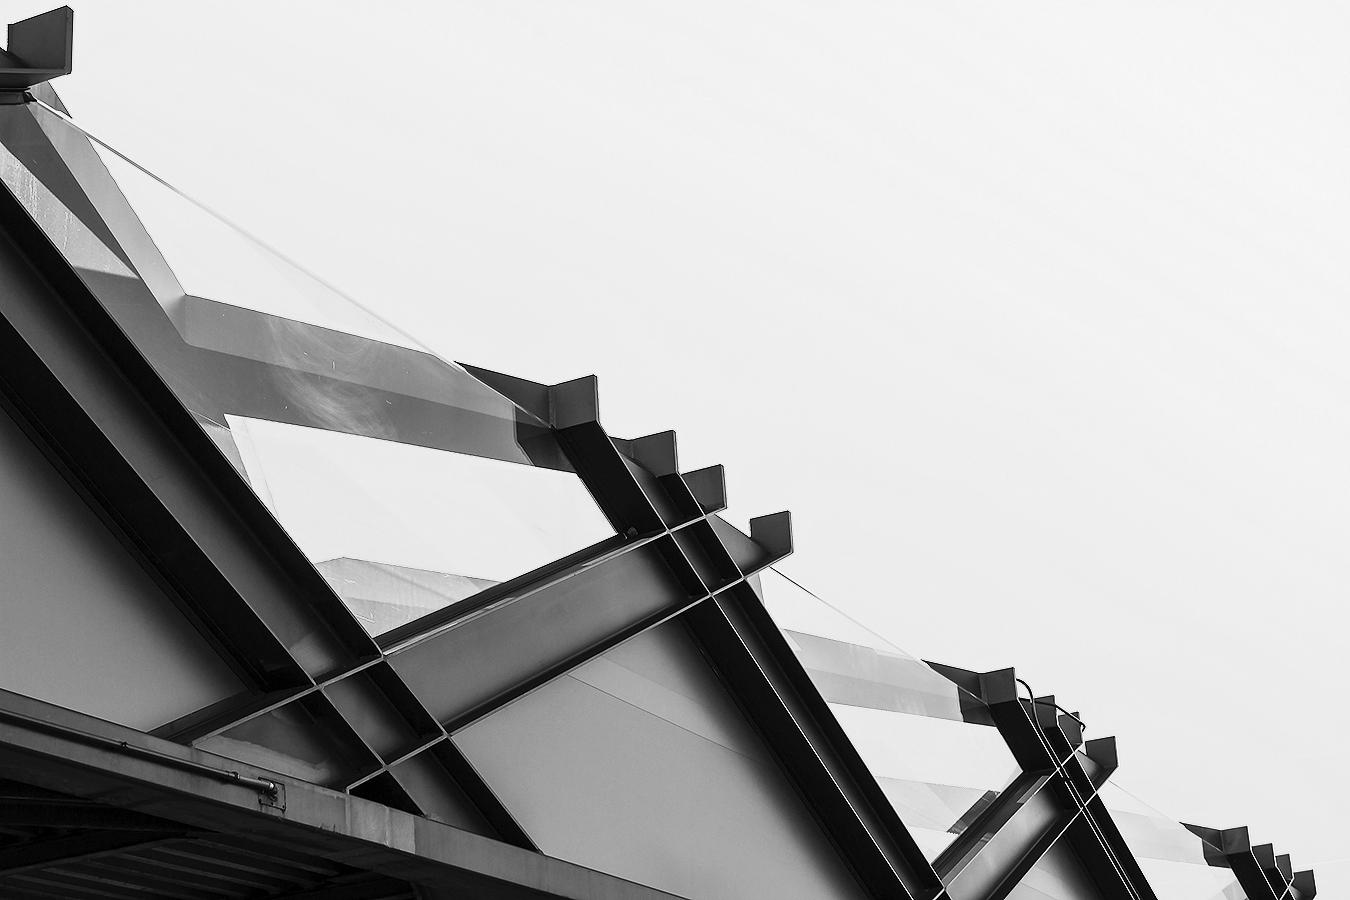 Janelle_Tong_Photography_Tony_Ward_Studio_Individual_Project_UPenn_Penn_Park_Bridges_Skyline_Bridge_Crosses_Sky_Contrast_Black_and_White_Minimalist_2